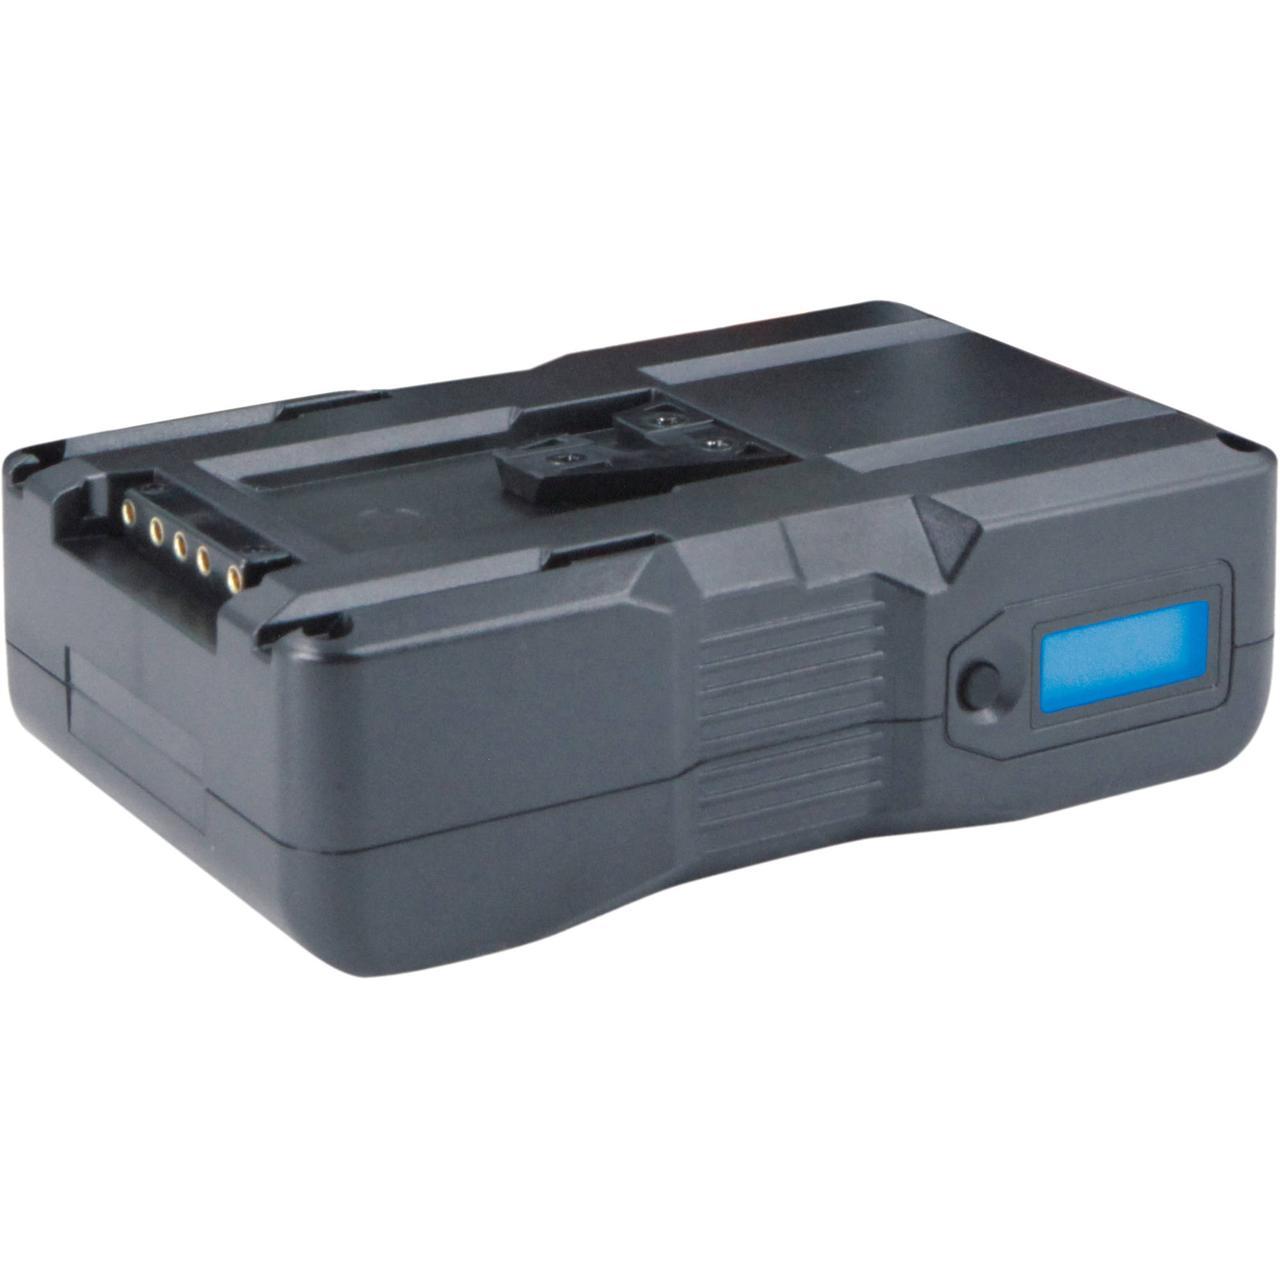 Аккумулятор FXlion BP-160SL 160Wh Cool Blue V Mount Battery (BP-160SL)